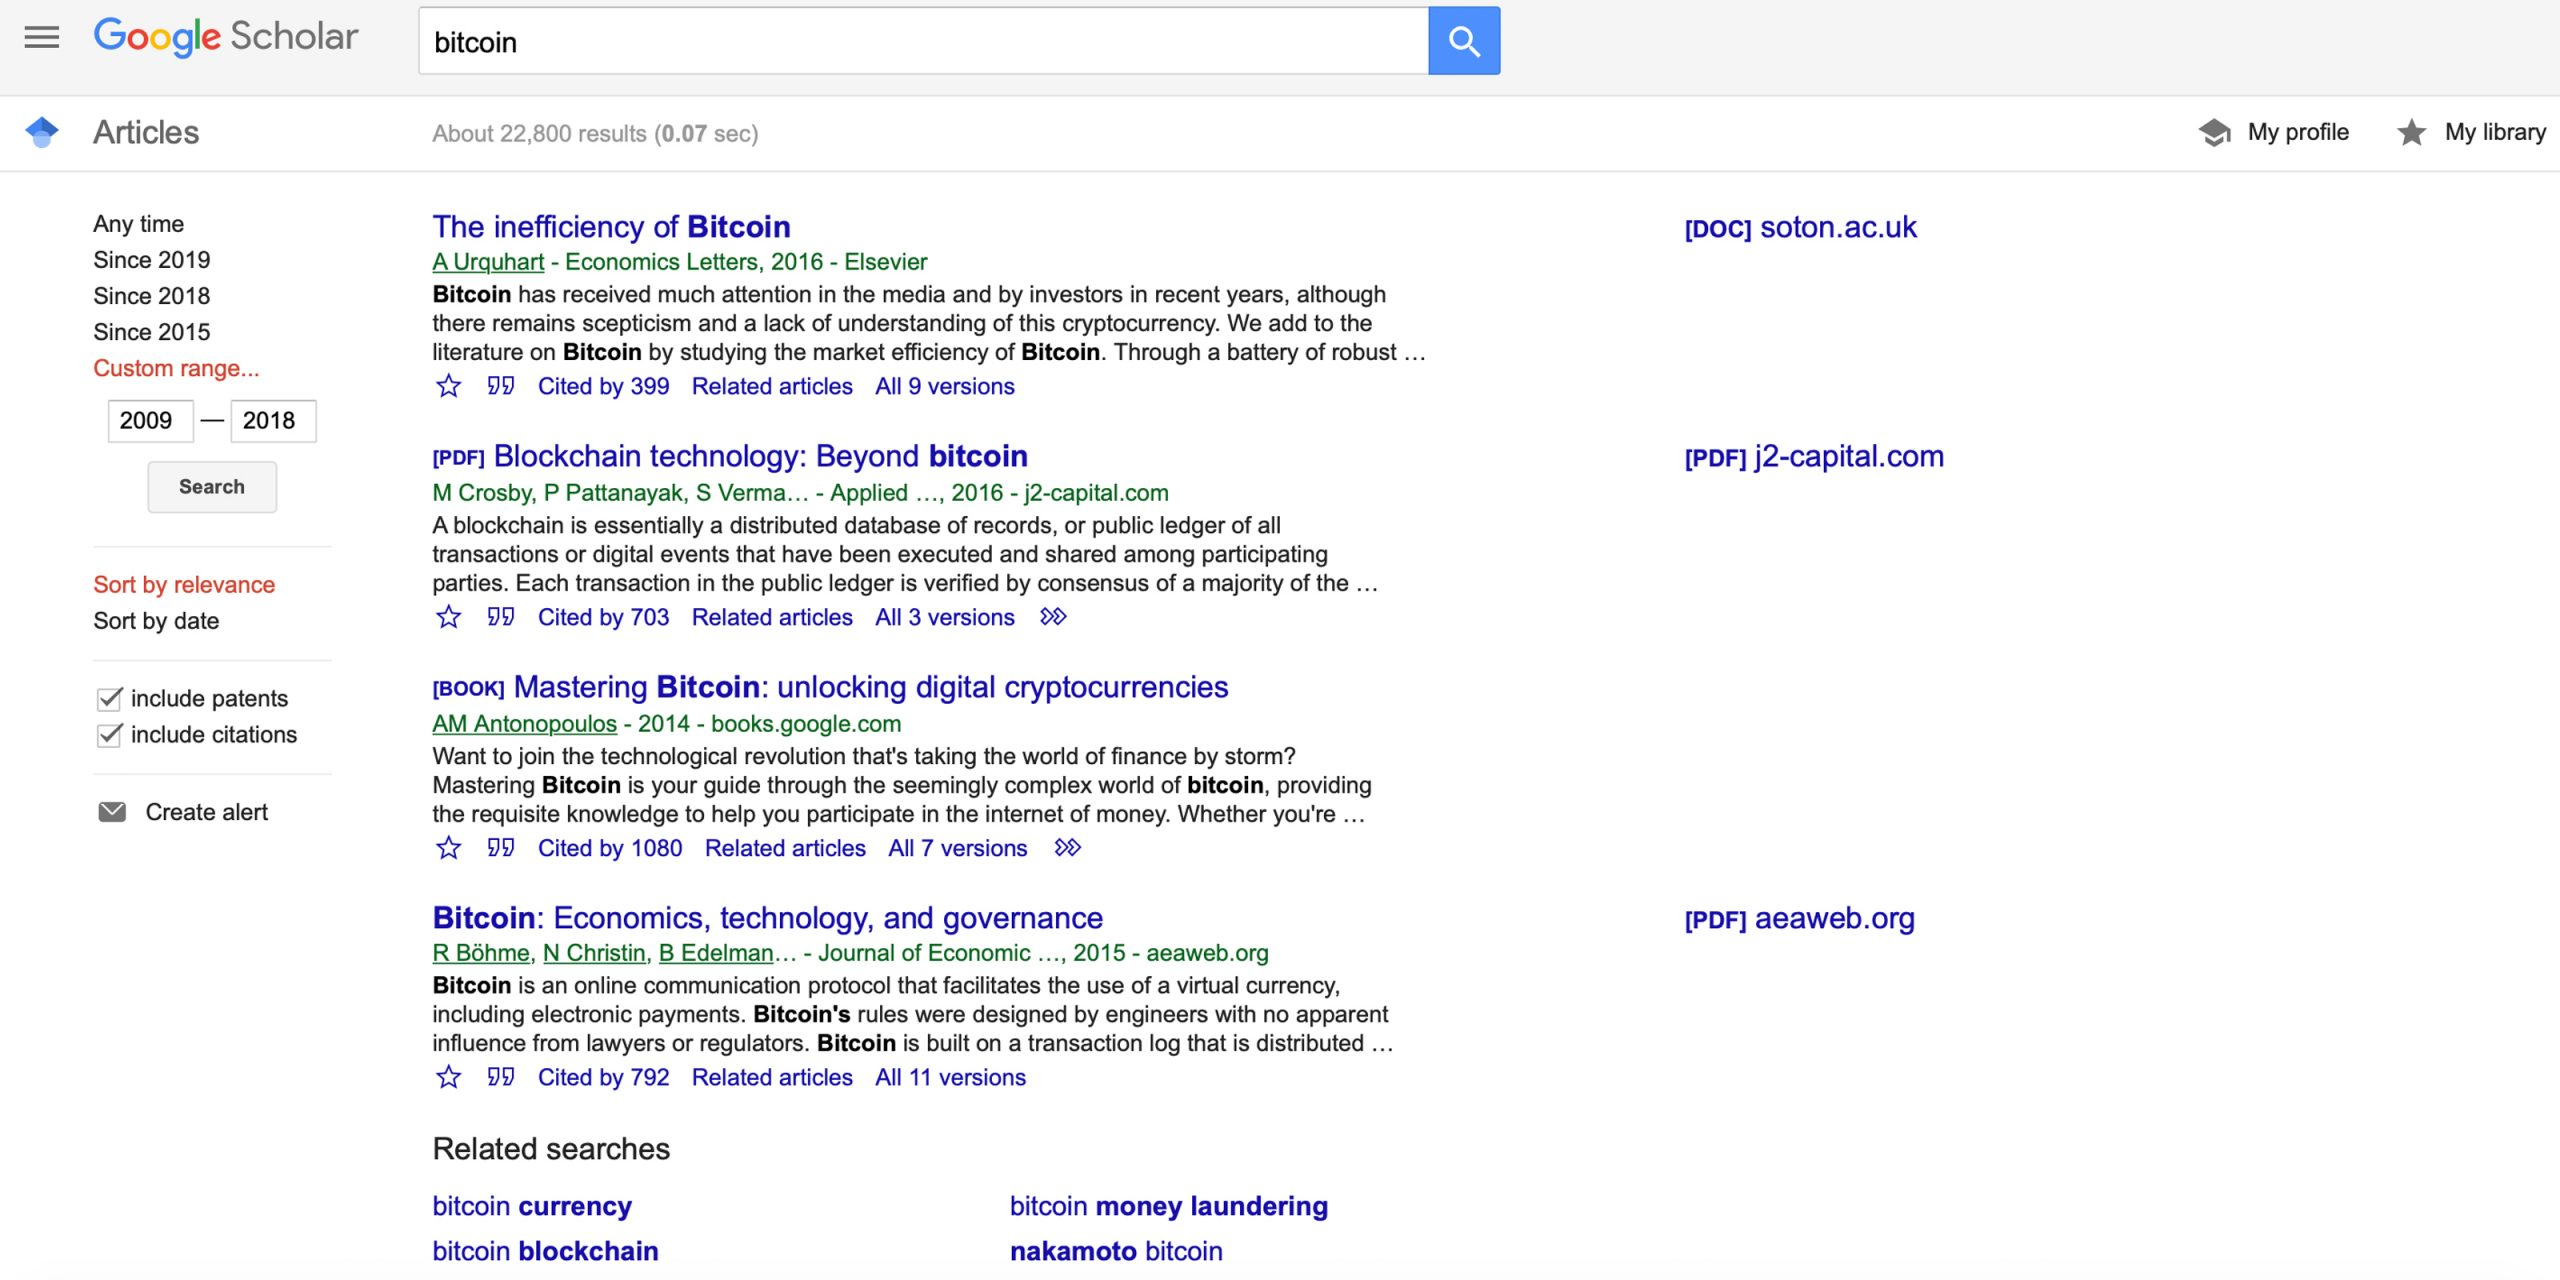 "Cerca de 14,000 artículos de Google Scholar mencionaron Bitcoin en 2019 ""width ="" 2560 ""height ="" 1280 "" srcset = ""https://blackswanfinances.com/wp-content/uploads/2019/12/newscholar-scaled.jpg 2560w, https://news.bitcoin.com/wp-content/uploads/2019/12/ newscholar-300x150.jpg 300w, https://news.bitcoin.com/wp-content/uploads/2019/12/newscholar-1024x512.jpg 1024w, https://news.bitcoin.com/wp-content/uploads/ 2019/12 / newscholar-768x384.jpg 768w, https://news.bitcoin.com/wp-content/uploads/2019/12/newscholar-1536x768.jpg 1536w, https://news.bitcoin.com/wp- content / uploads / 2019/12 / newscholar-2048x1024.jpg 2048w, https://news.bitcoin.com/wp-content/uploads/2019/12/newscholar-696x348.jpg 696w, https: //news.bitcoin. com / wp-content / uploads / 2019/12 / newscholar-1392x696.jpg 1392w, https://news.bitcoin.com/wp-content/uploads/2019/12/newscholar-1068x534.jpg 1068w, https: //news.bitcoin.com/wp-content/uploads/2019/12/newscholar-840x420.jpg 840w, https://news.bitcoin.com/wp-content/uploads/2019/12/newscholar-1920x960.jpg 1920w ""tamaños ="" (ancho máximo: 2560px) 100vw, 2560px"